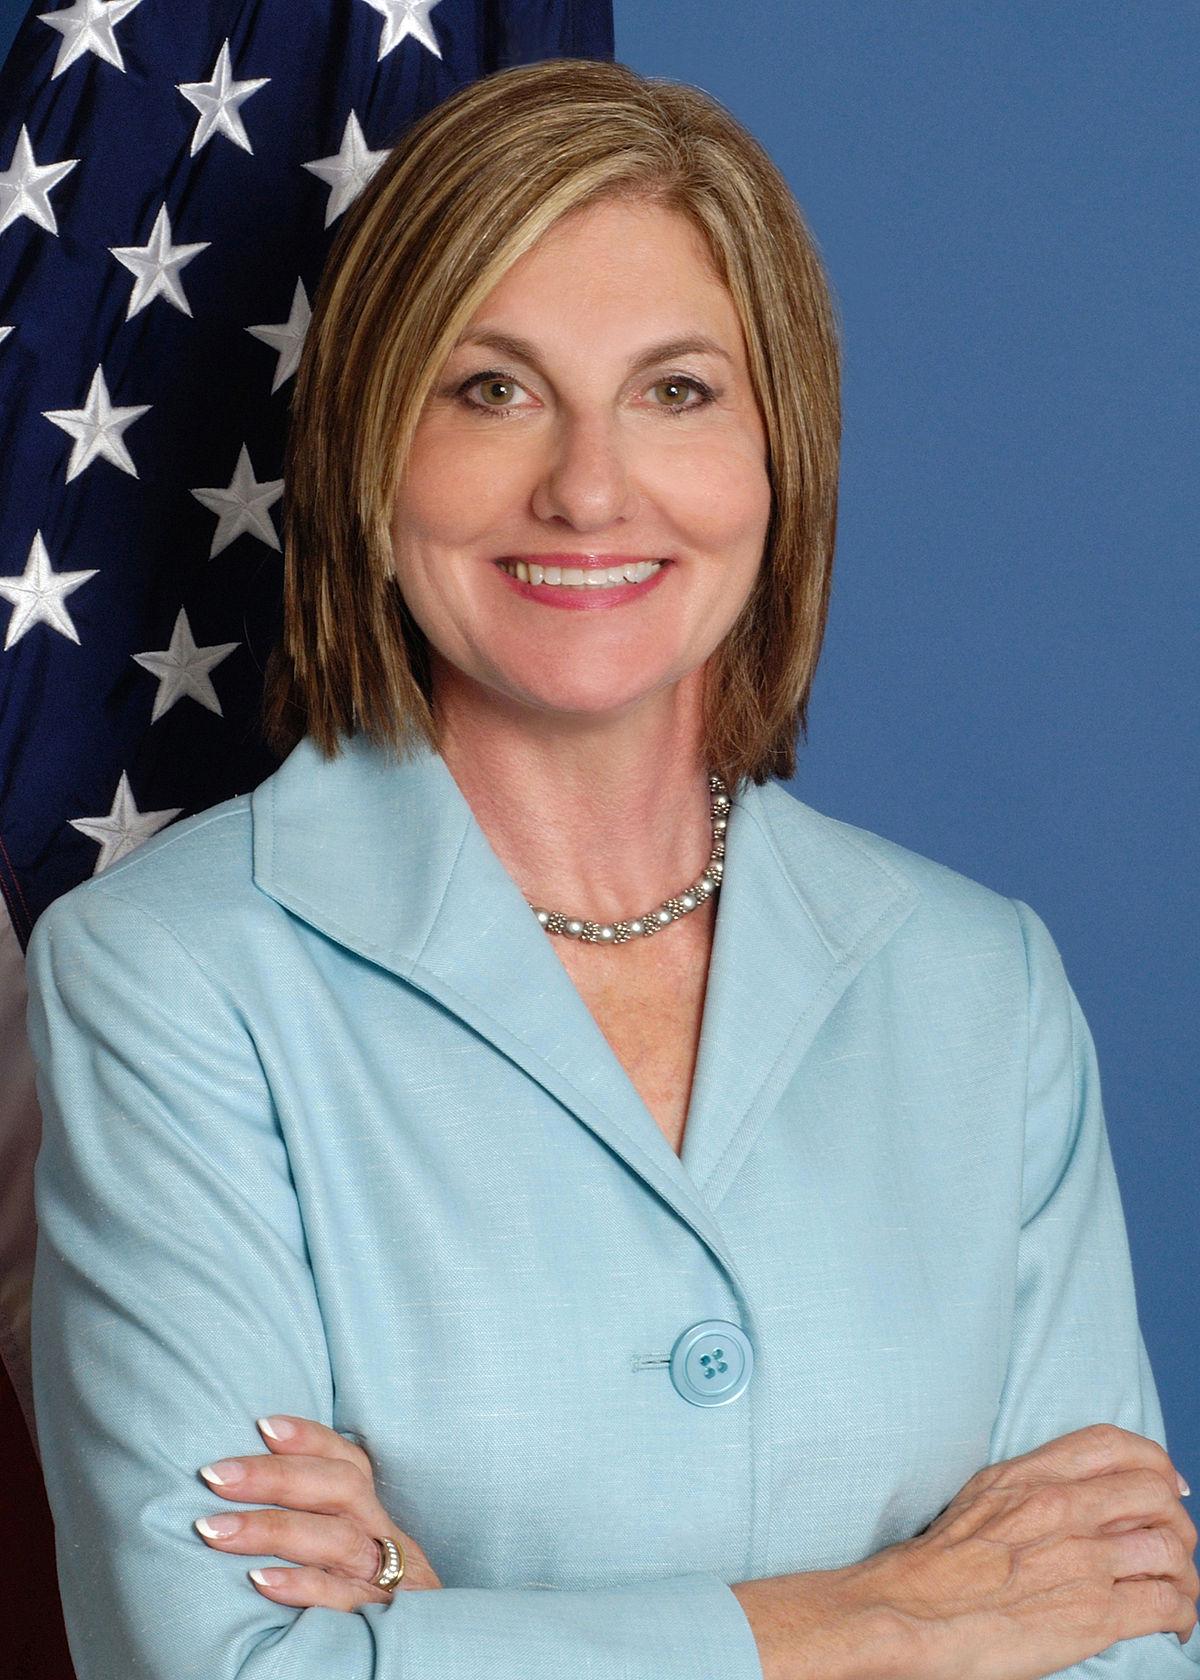 Debbie Matz - Wikipedia